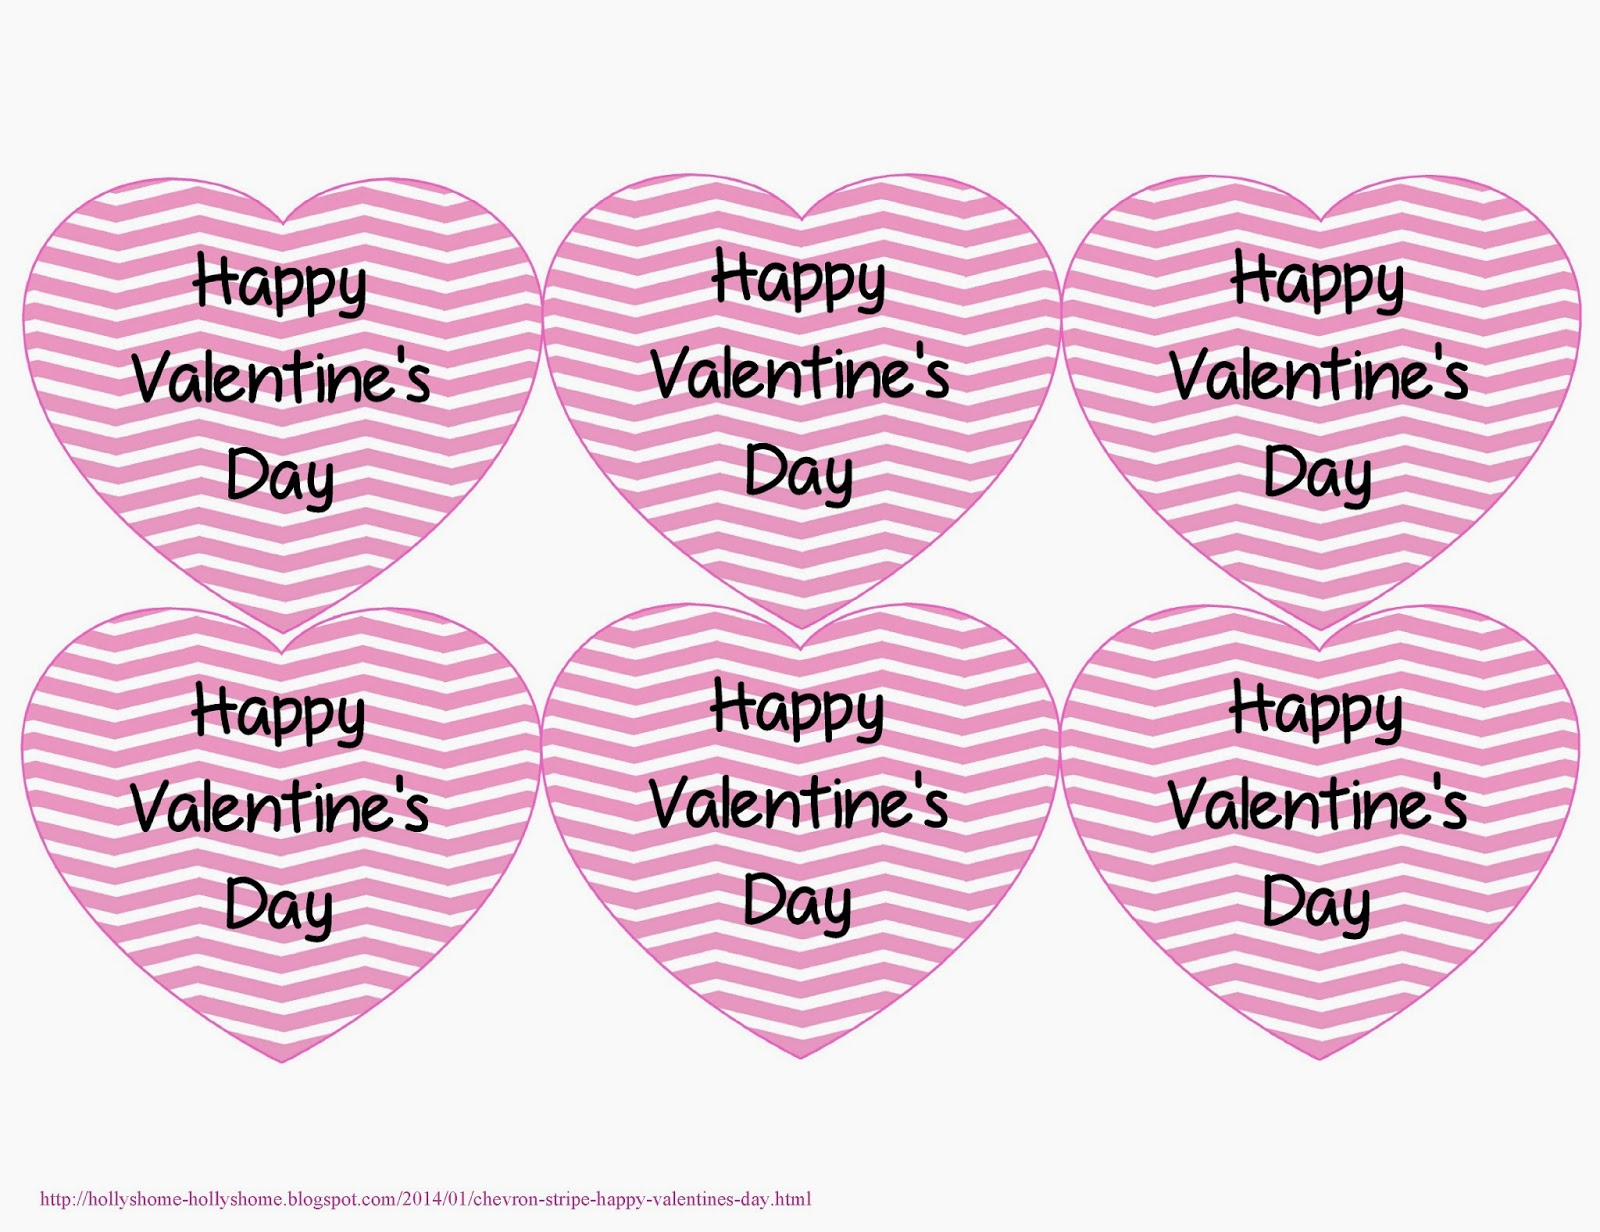 http://hollyshome-hollyshome.blogspot.com/2014/01/chevron-stripe-happy-valentines-day.html